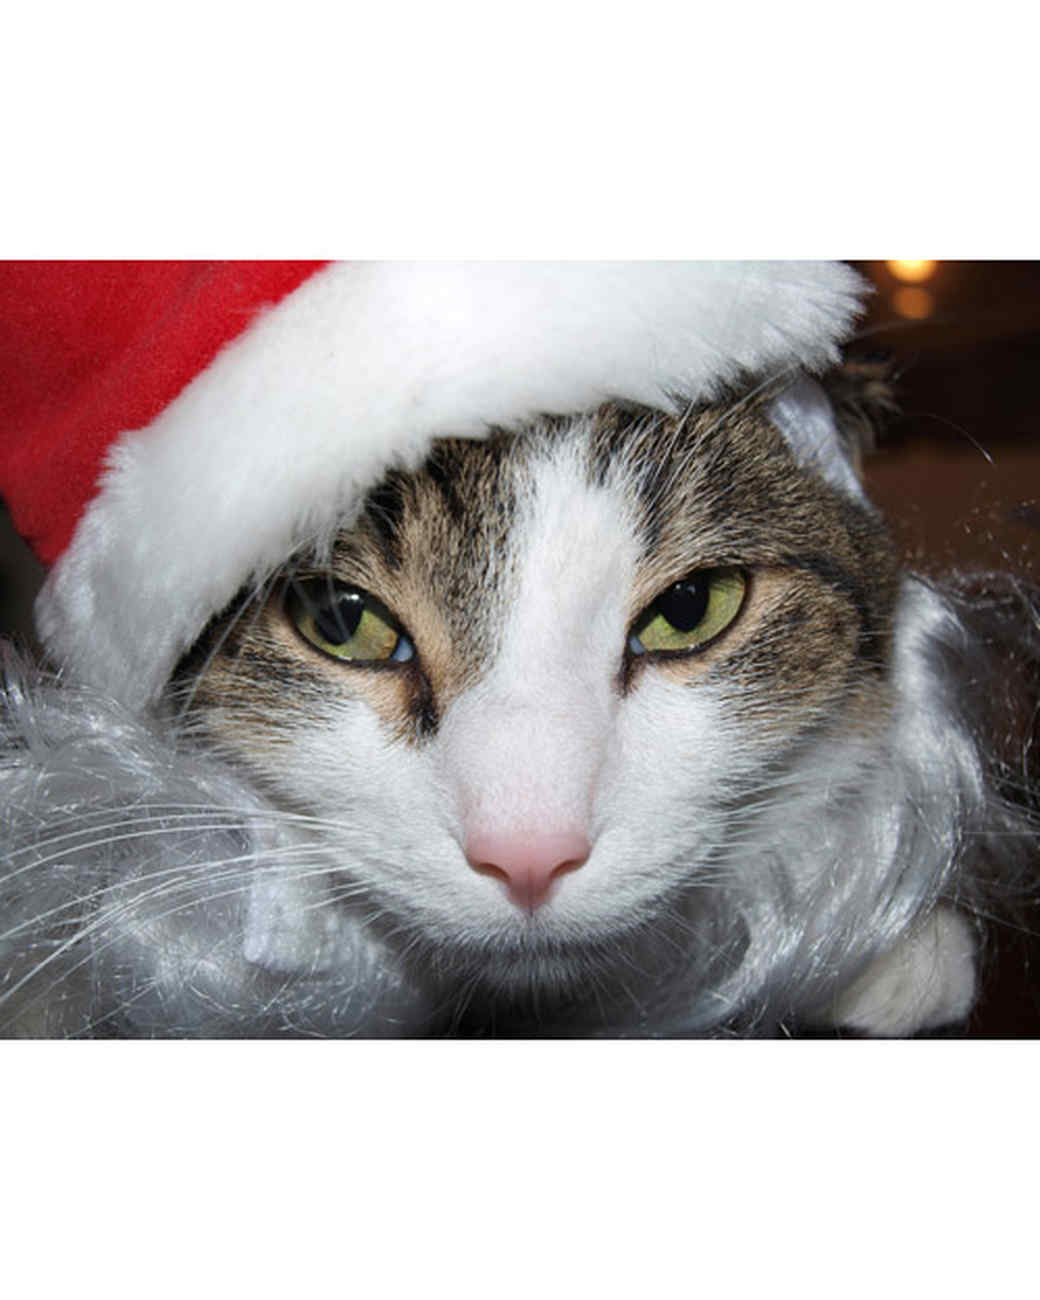 pets_santa09_6988120_11431221_main.jpg